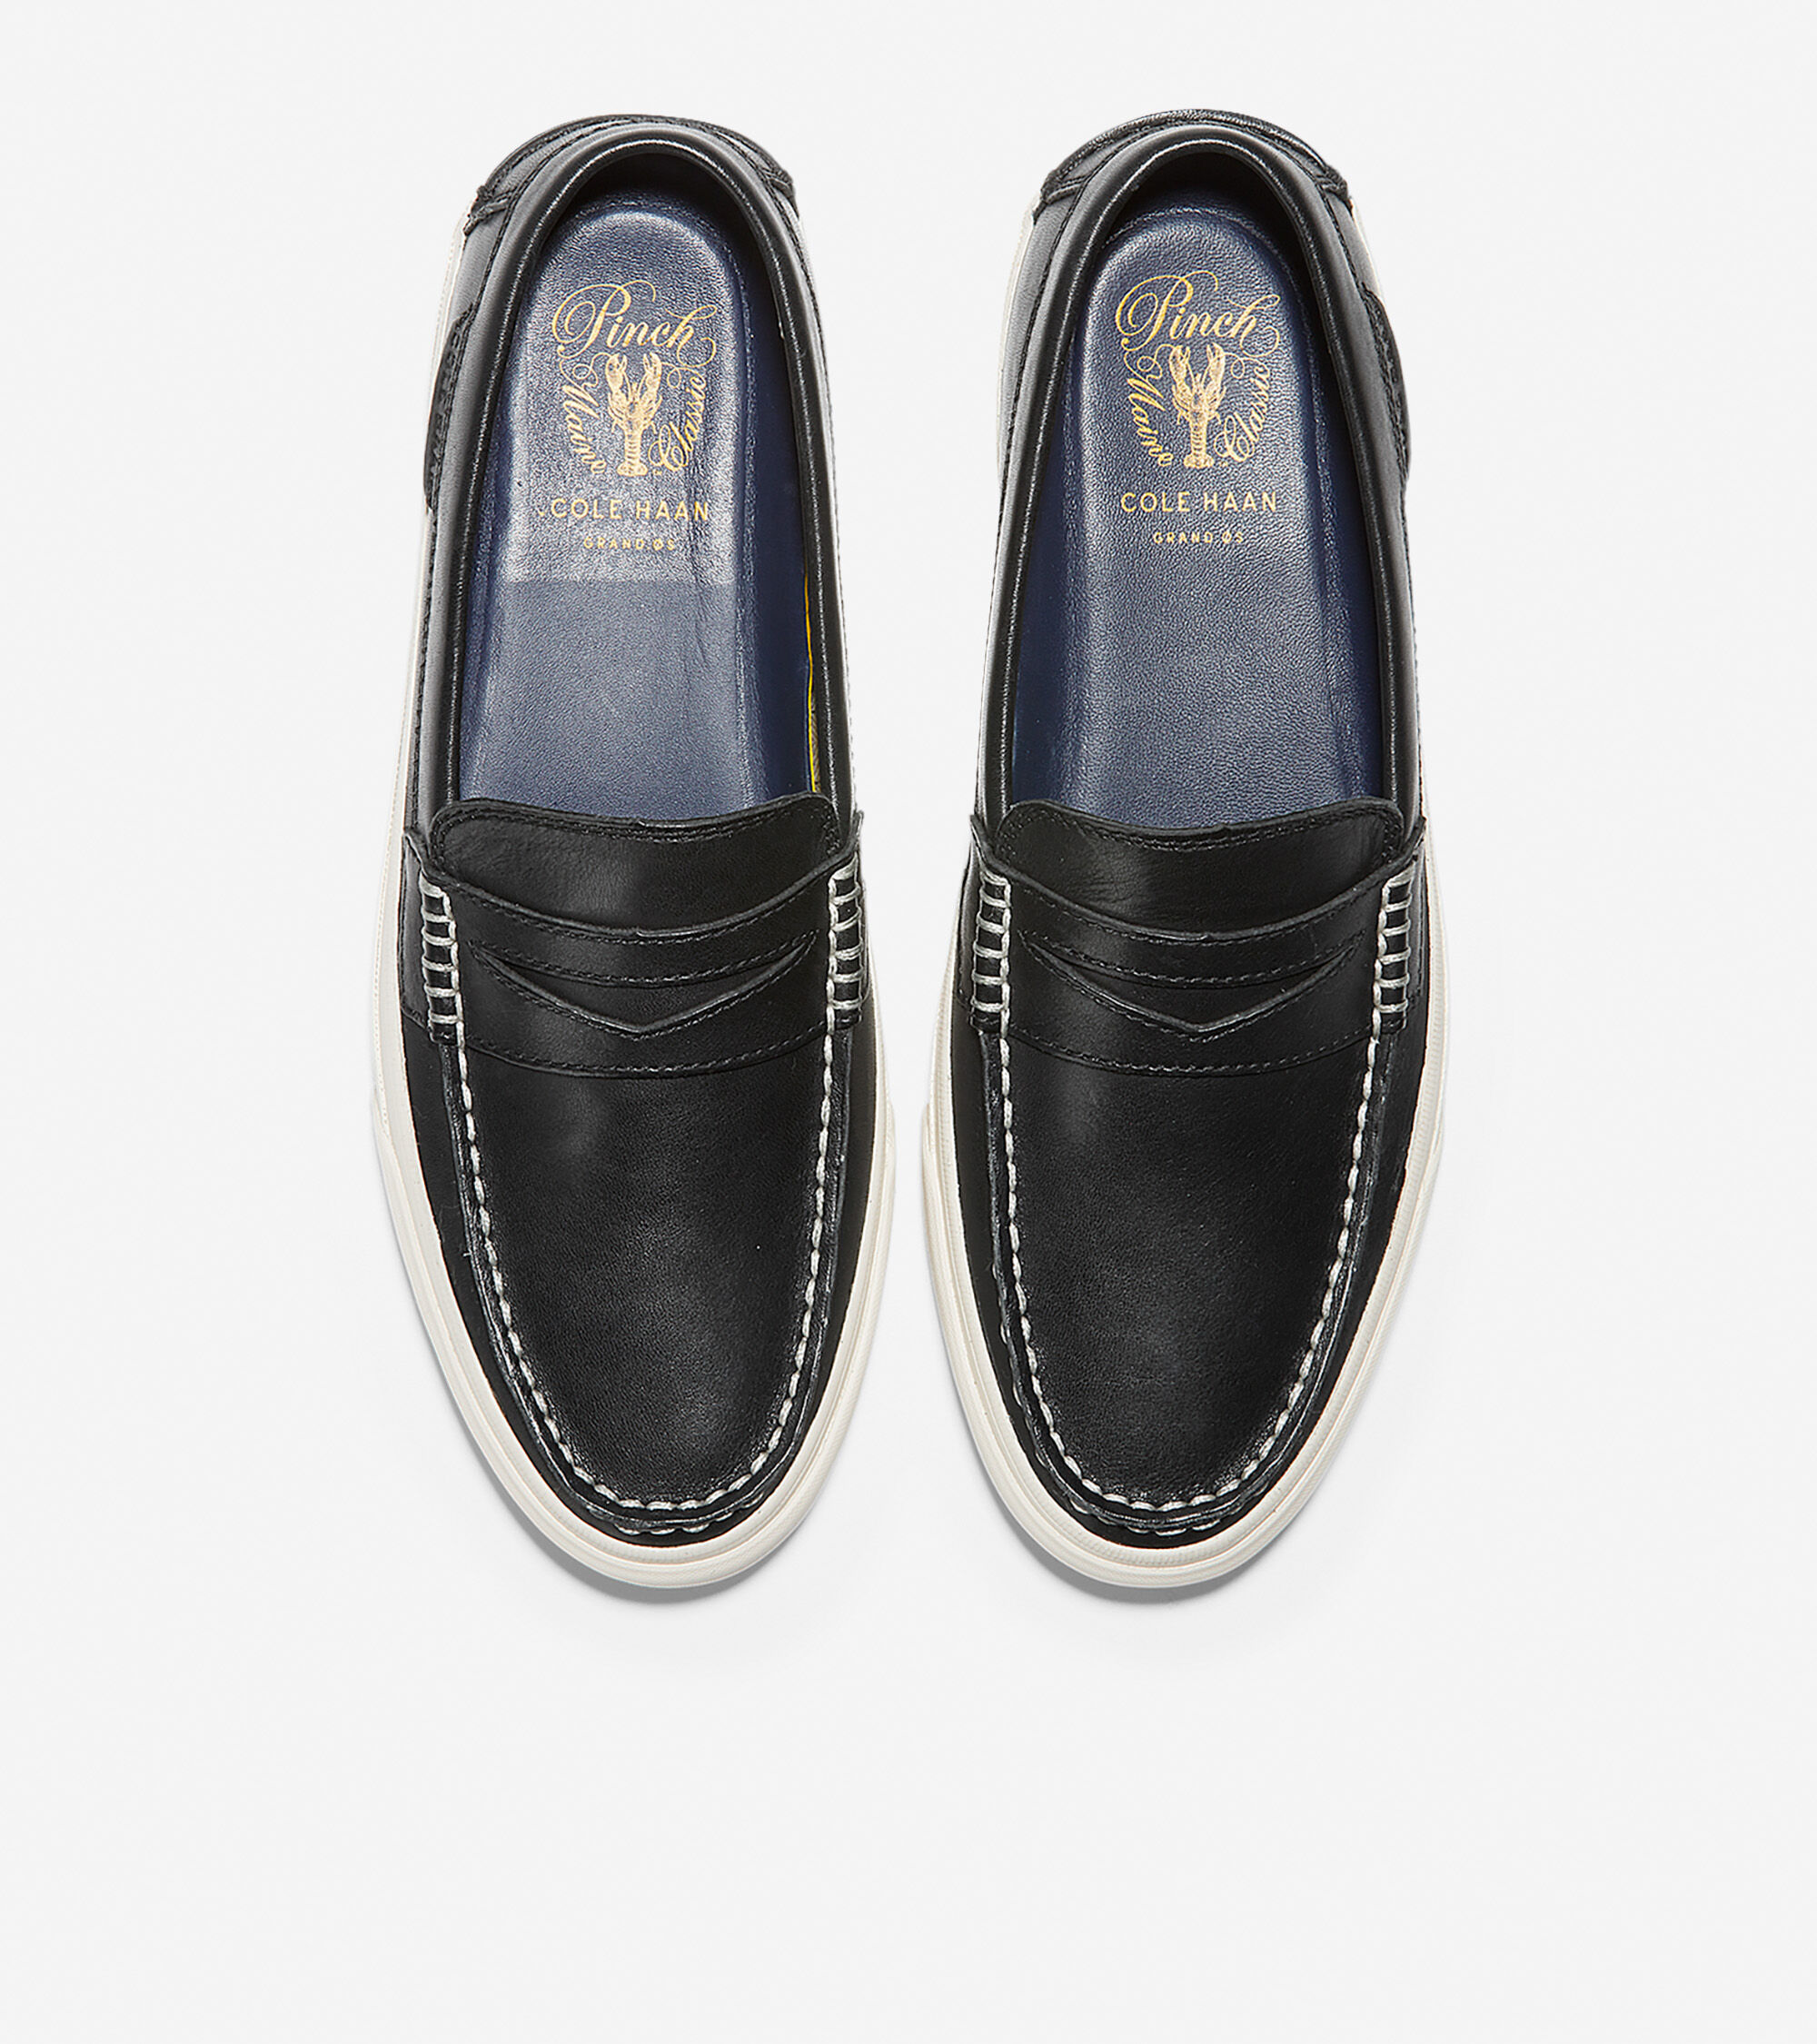 c072f6b53cd Men s Pinch Weekender LX Penny Loafers in Black-White